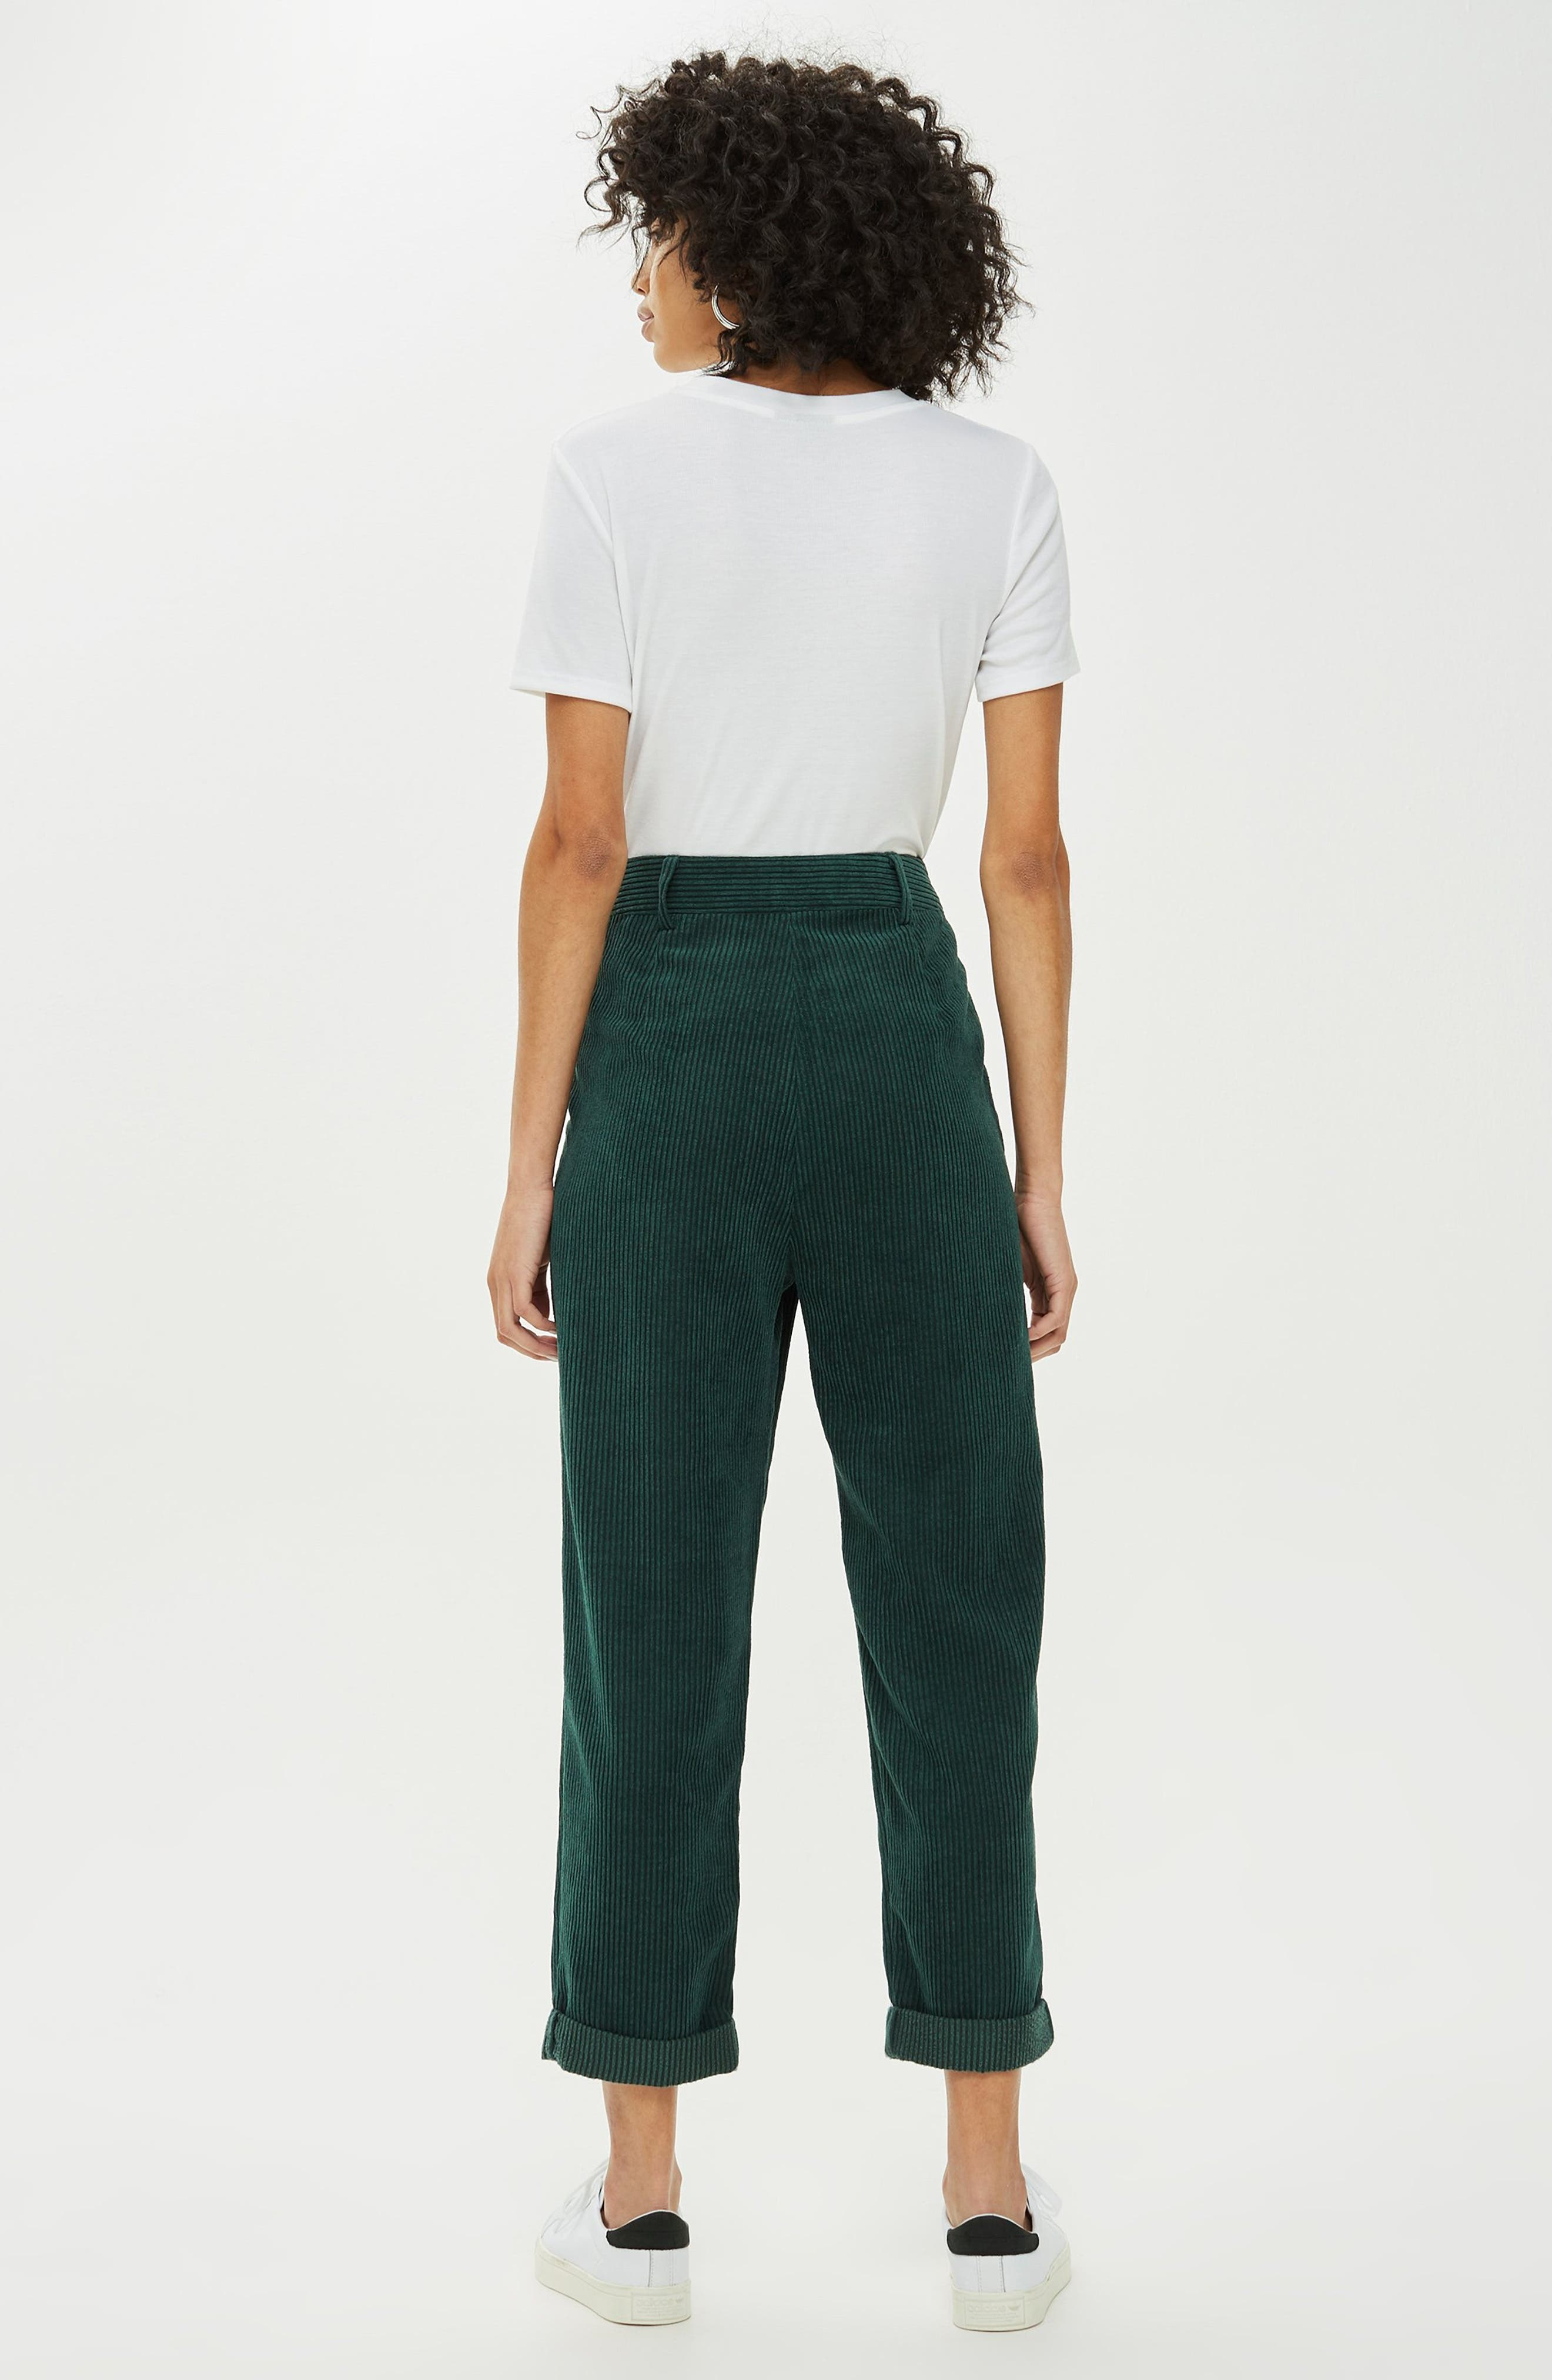 59907cc8b74 Women s Corduroy Clothing